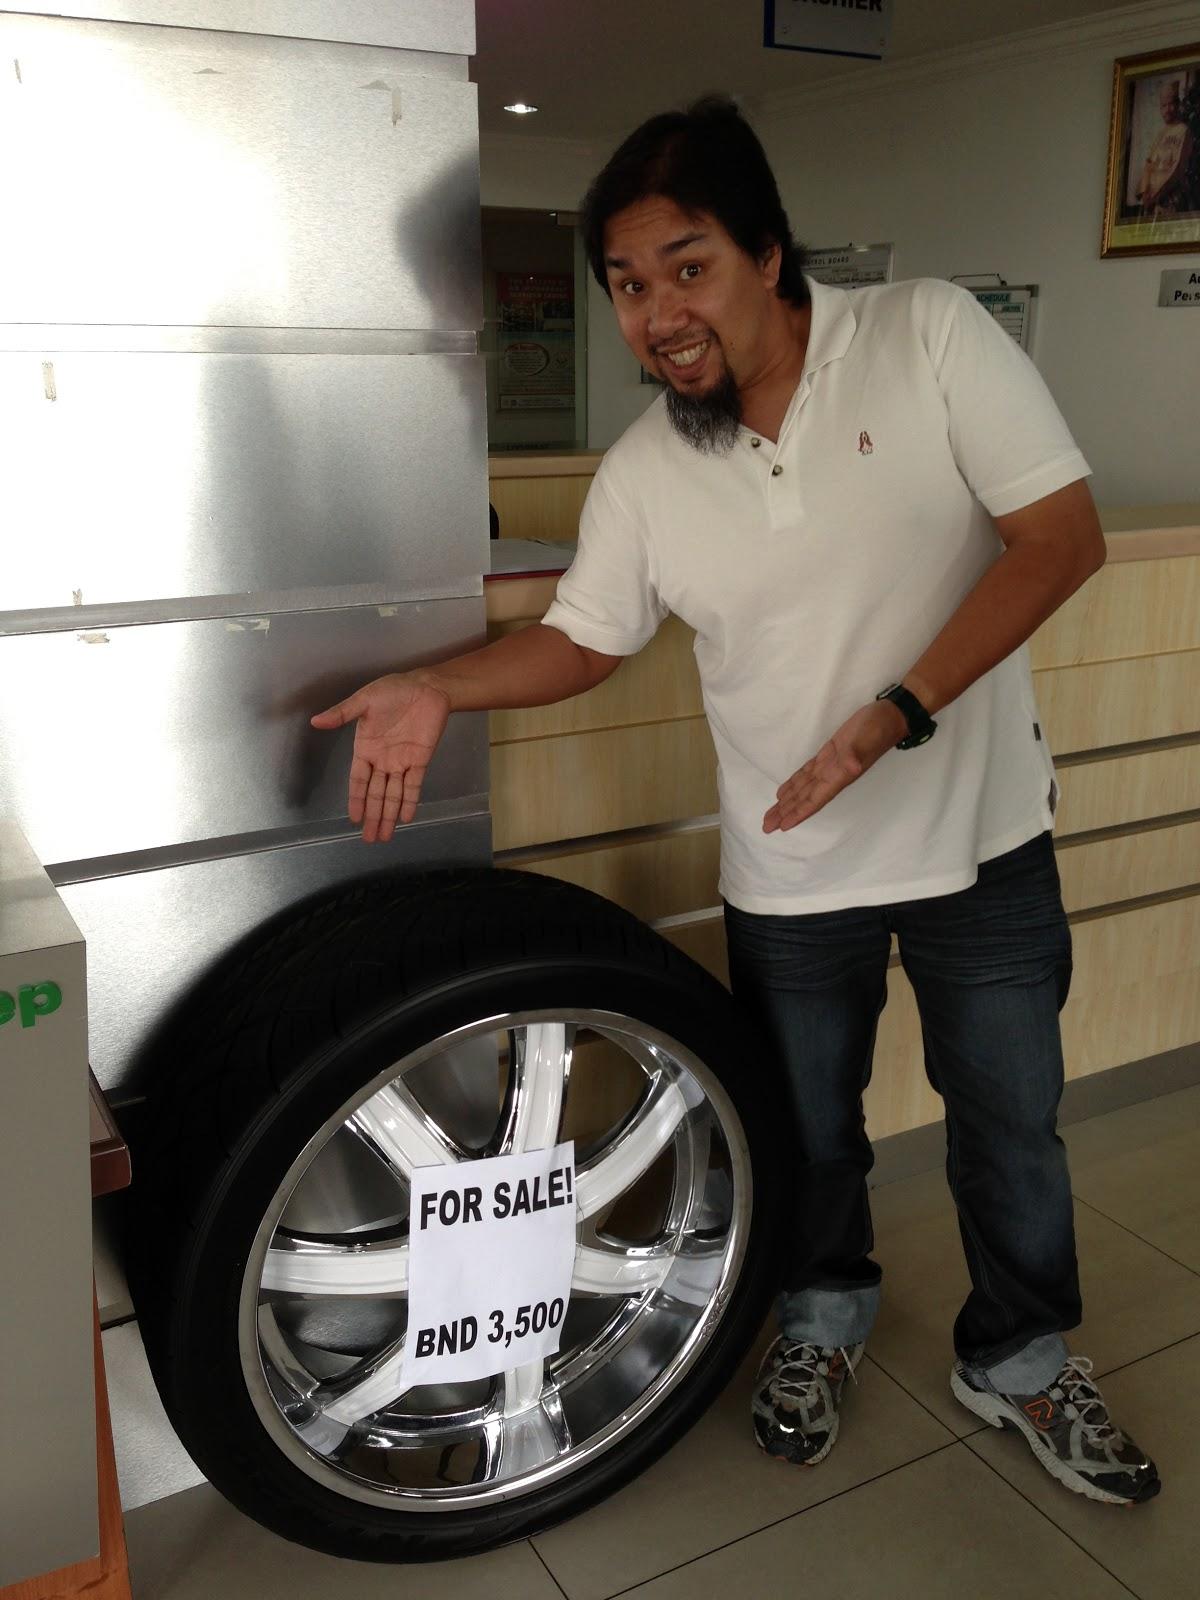 Tigerlimcom 24 Inch Rims For Sale